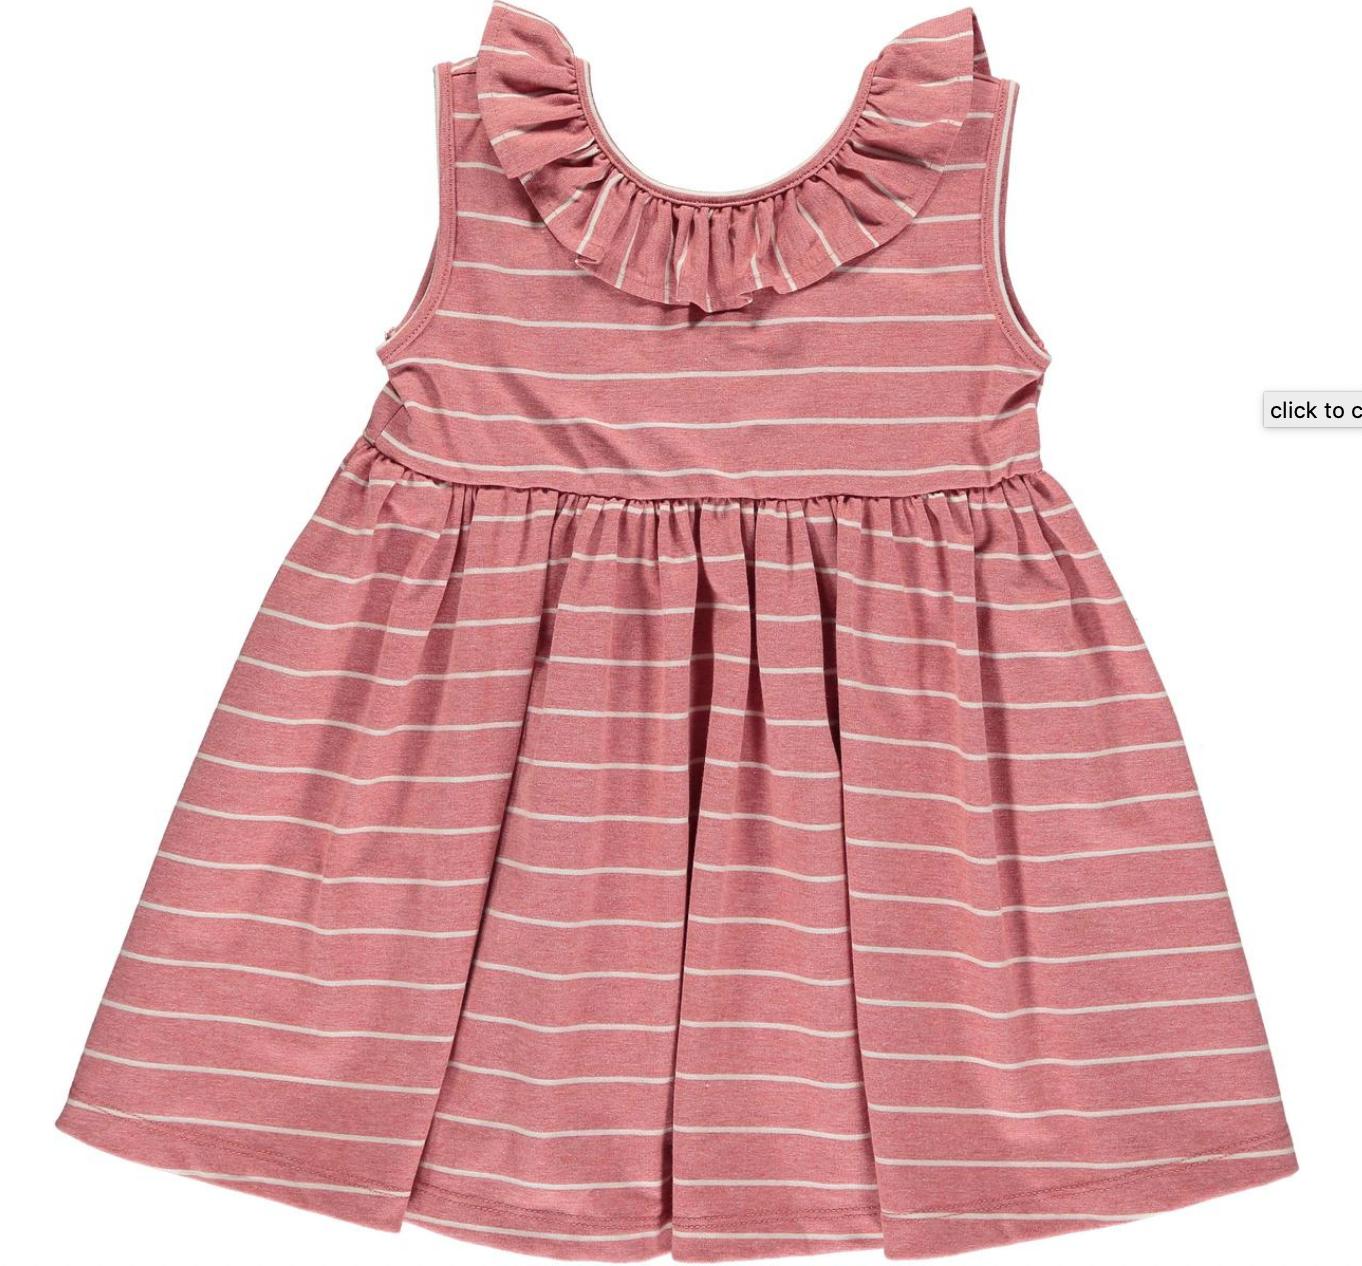 Vignette Vignette | Bella Dress in Cherry